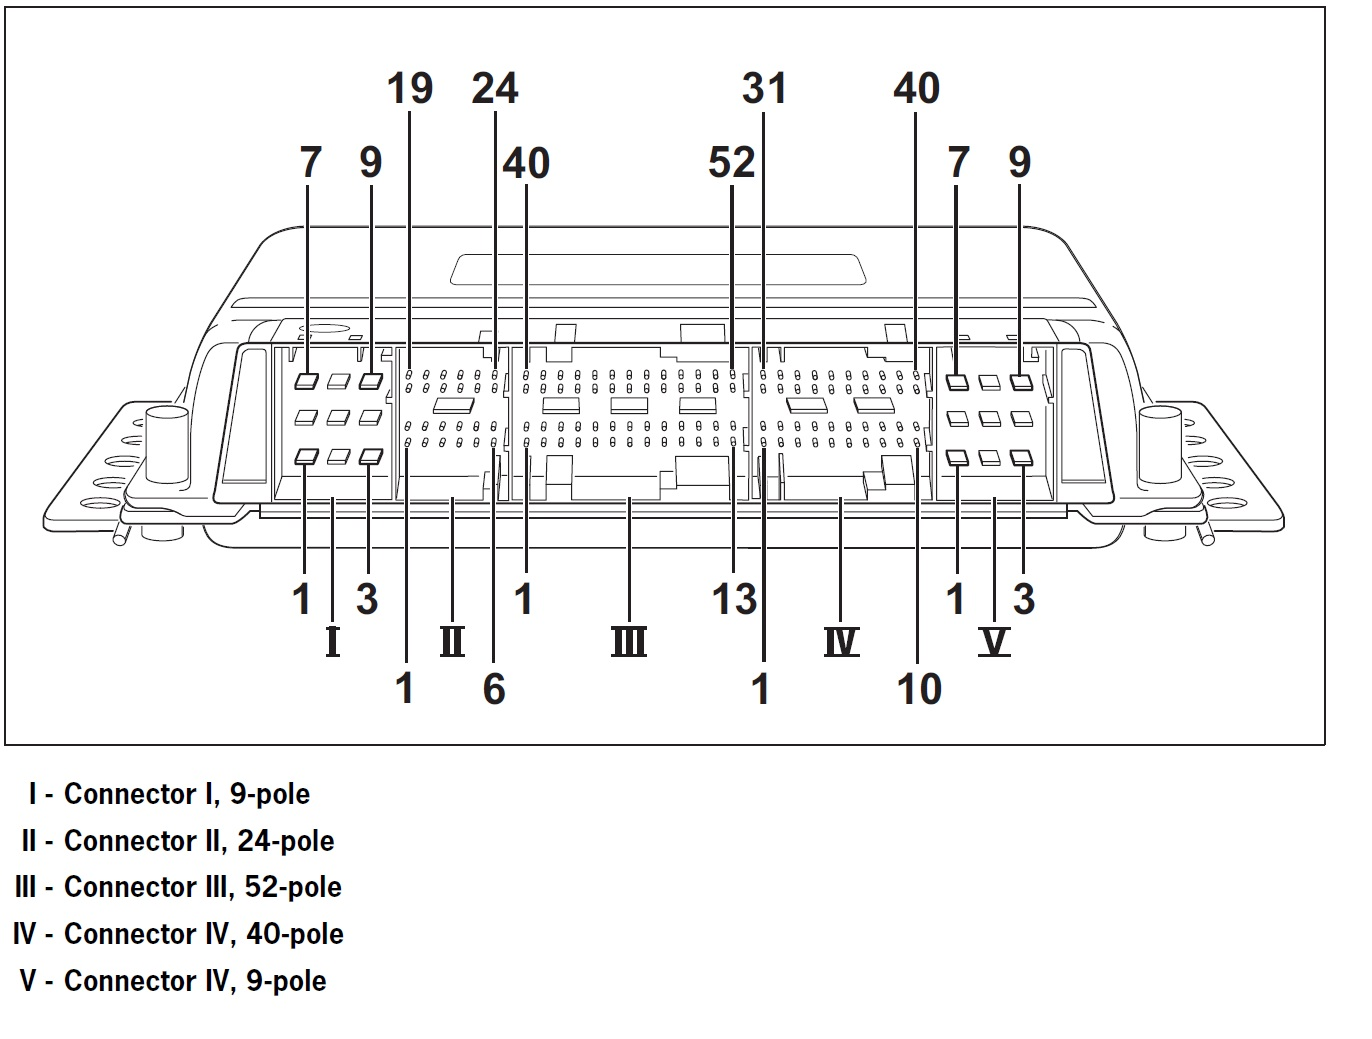 Porsche 997.1 Turbo DME Pinout ECU : Pinout cable and